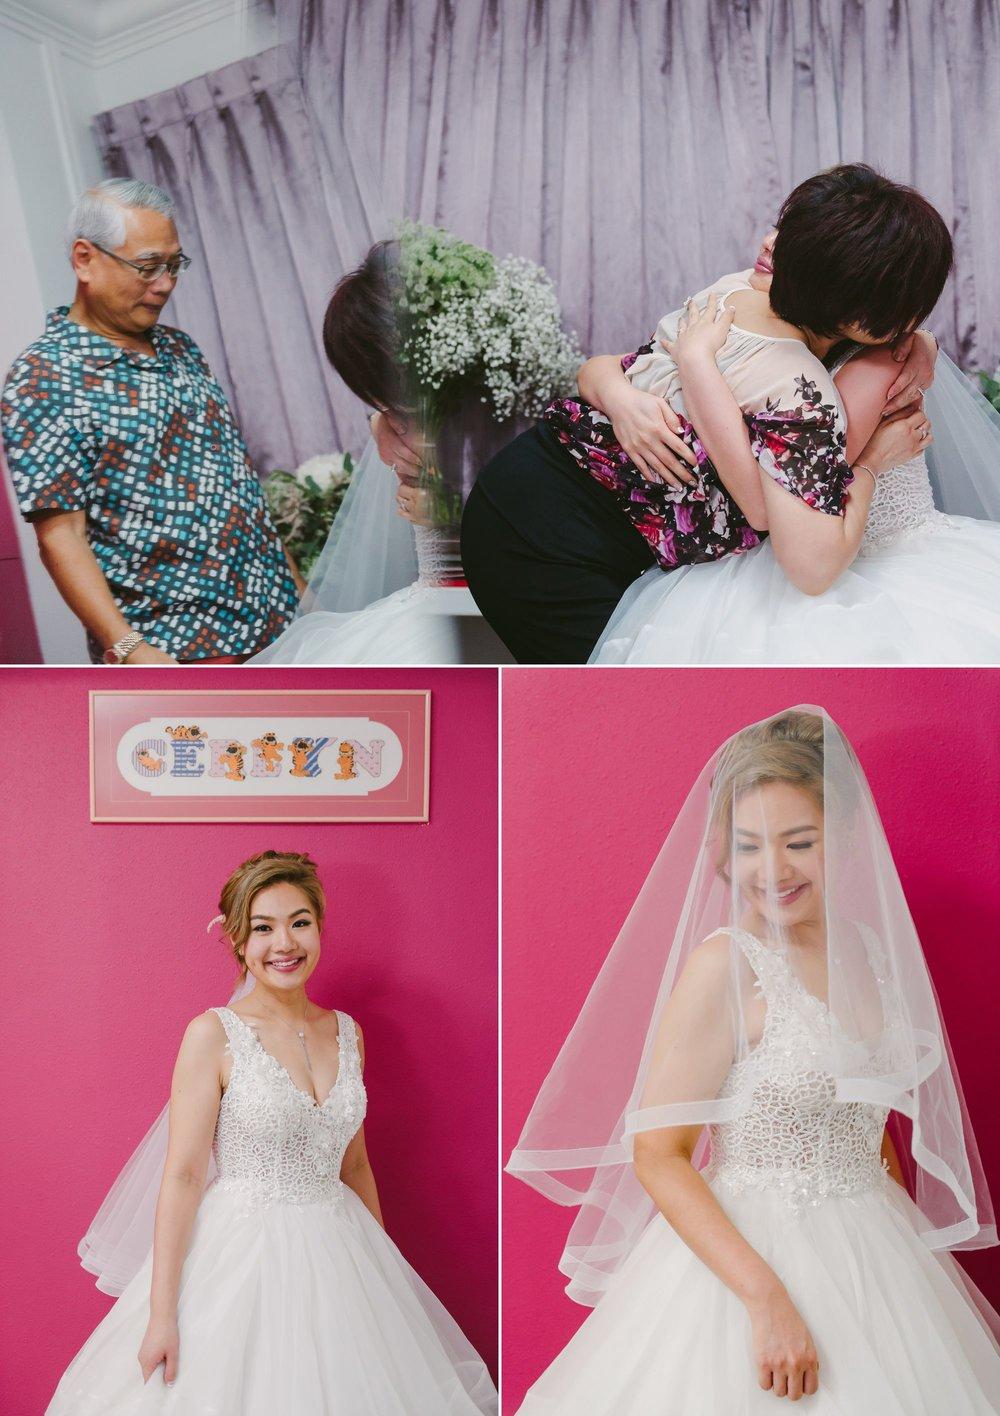 wedding_photographer_singapore 6.jpg